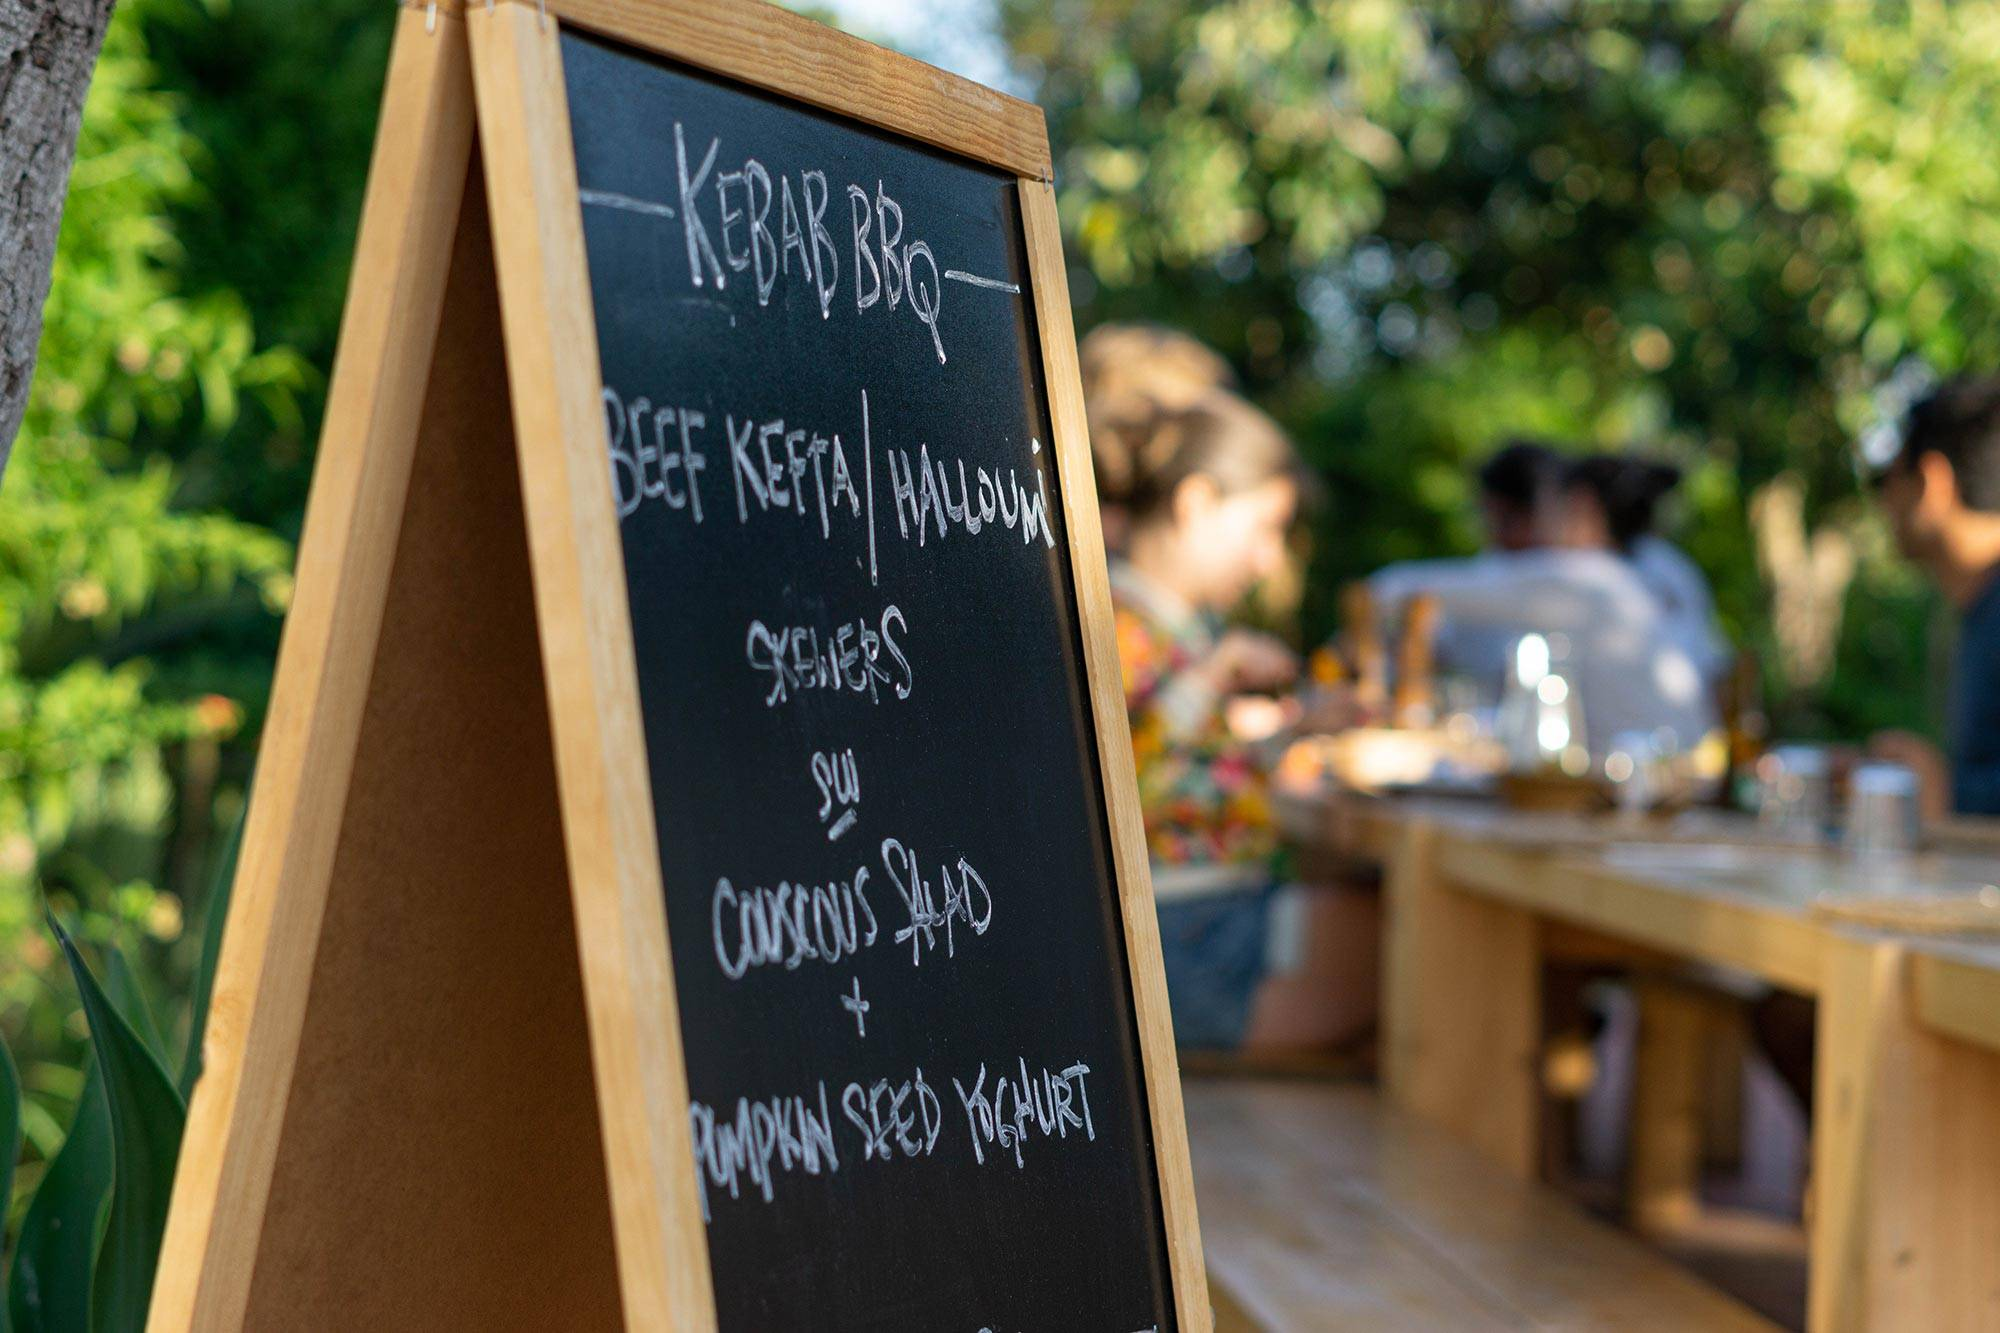 https://www.soulandsurf.com/wp-content/uploads/2021/07/@joeliooo_Food_board_2.jpg Image